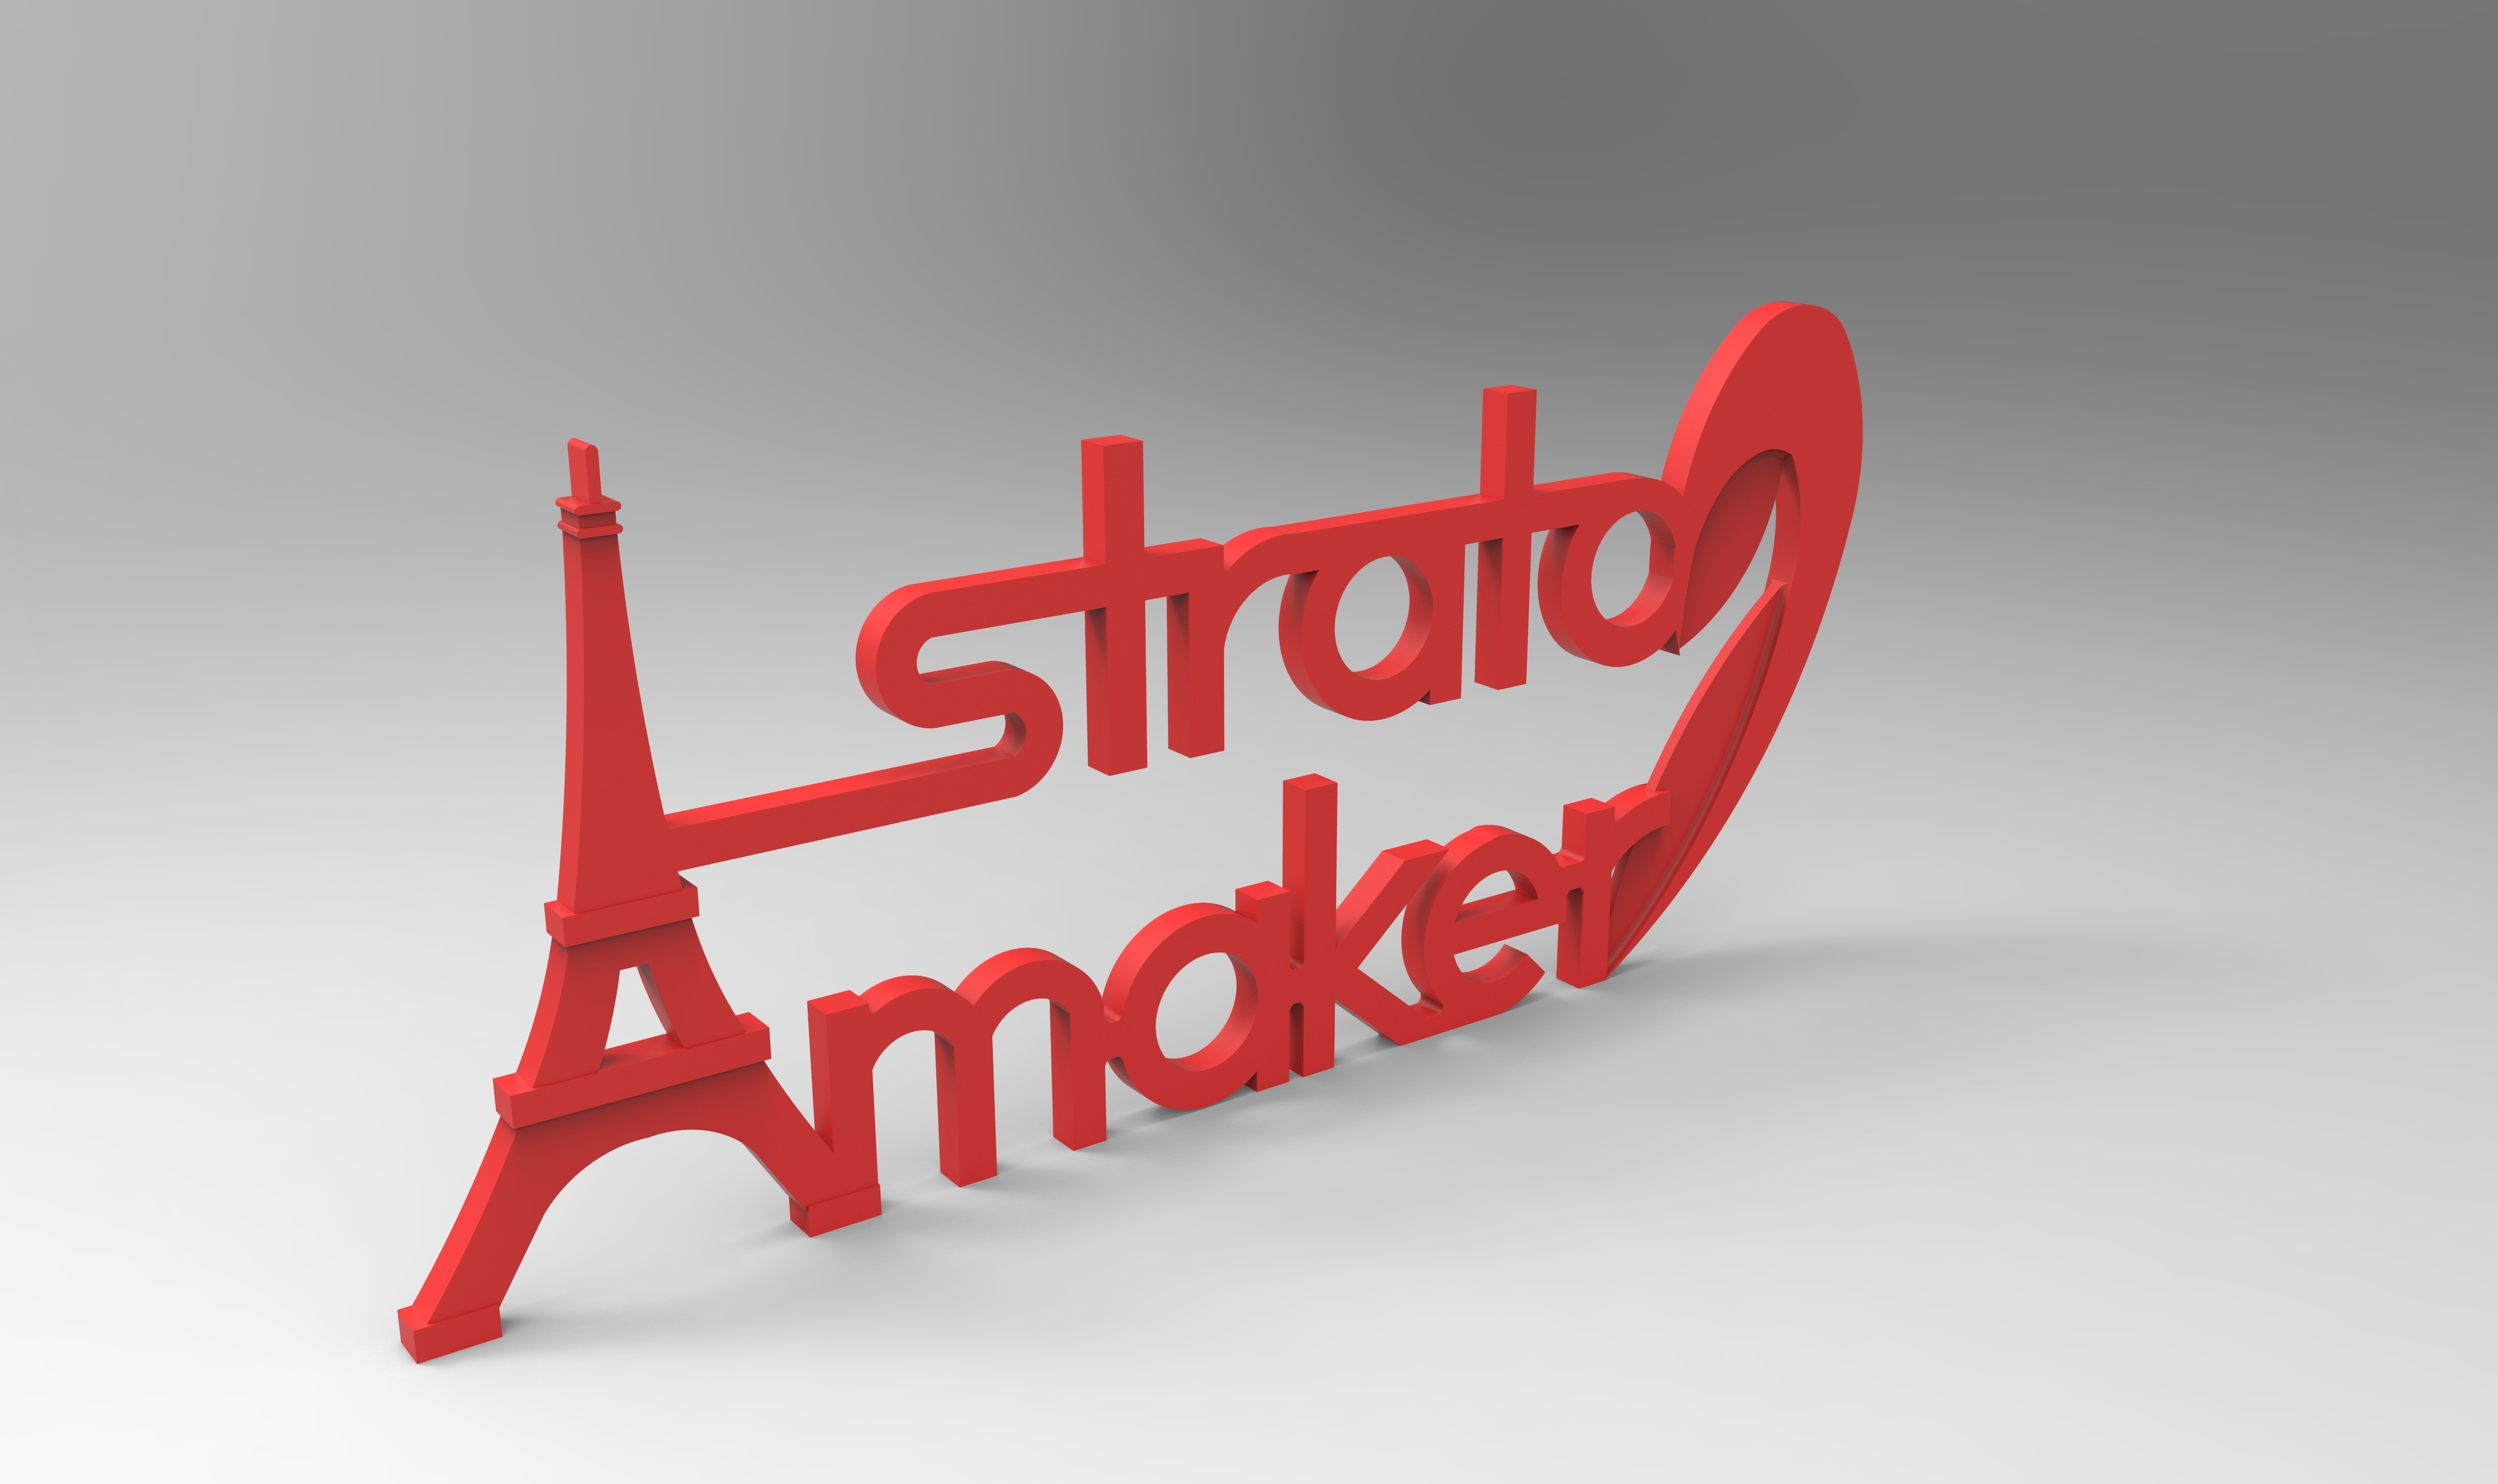 rendu plaque 2 face 275.178.jpg Download free STL file Stratomaker brand and logo (Eiffel Tower) • 3D printer model, GuilhemPerroud